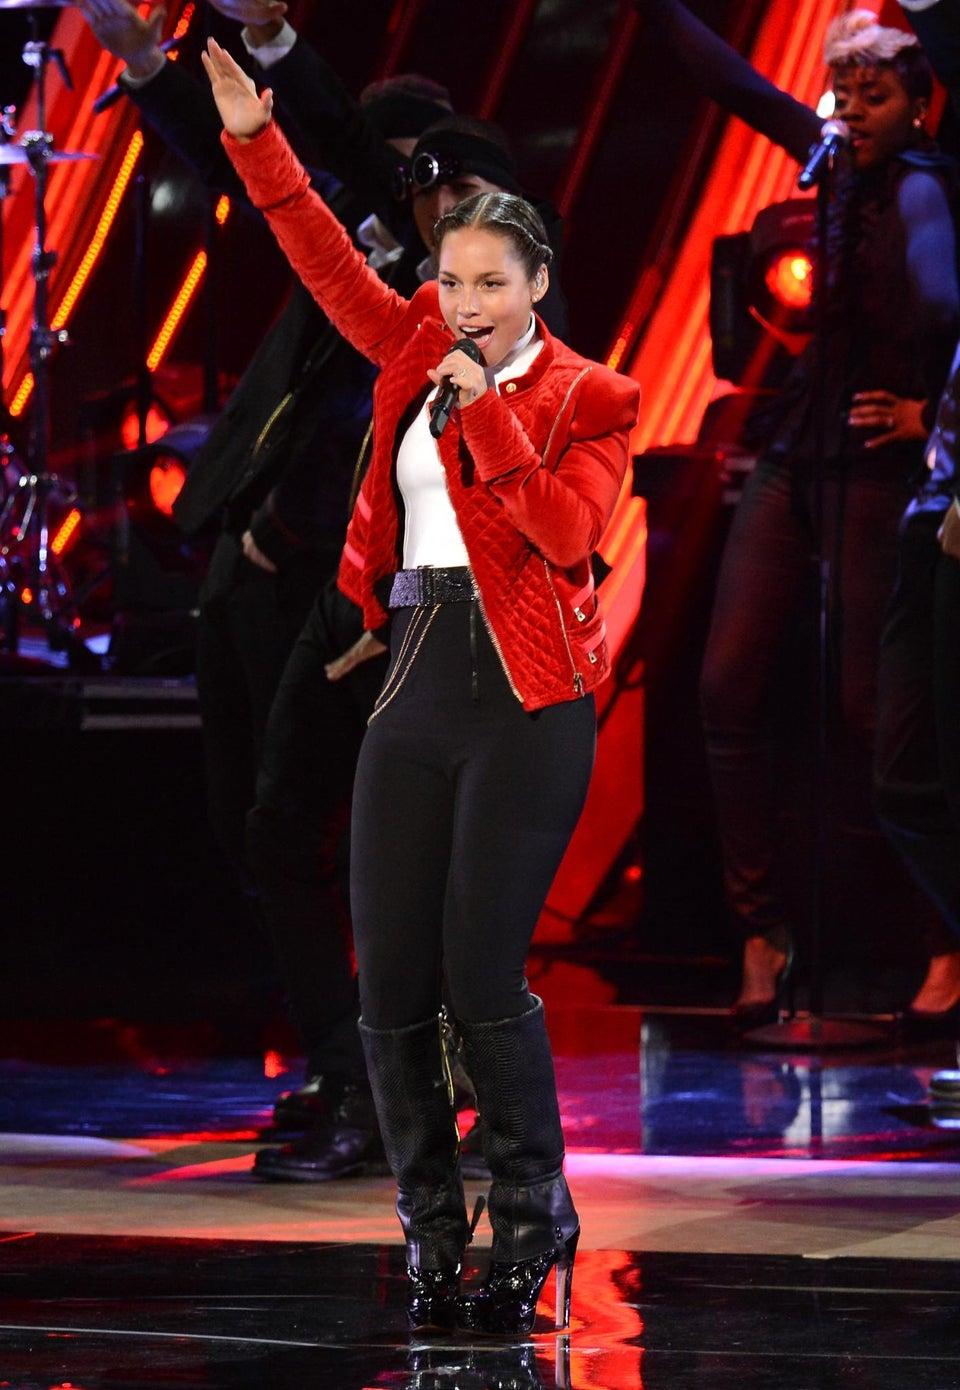 Alicia Keys to Sing National Anthem at Super Bowl